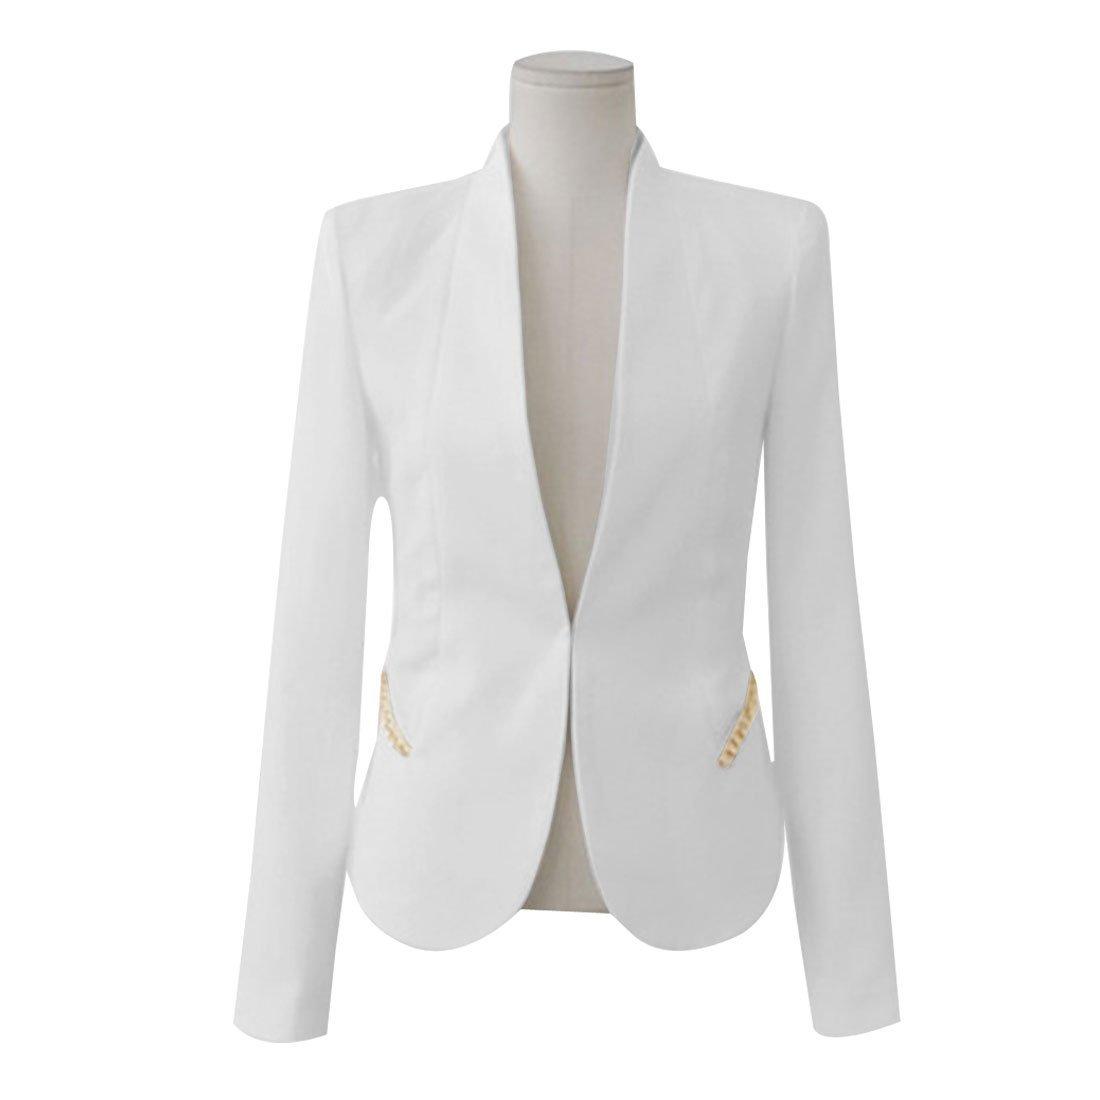 Off White Blazer Womens - Trendy Clothes